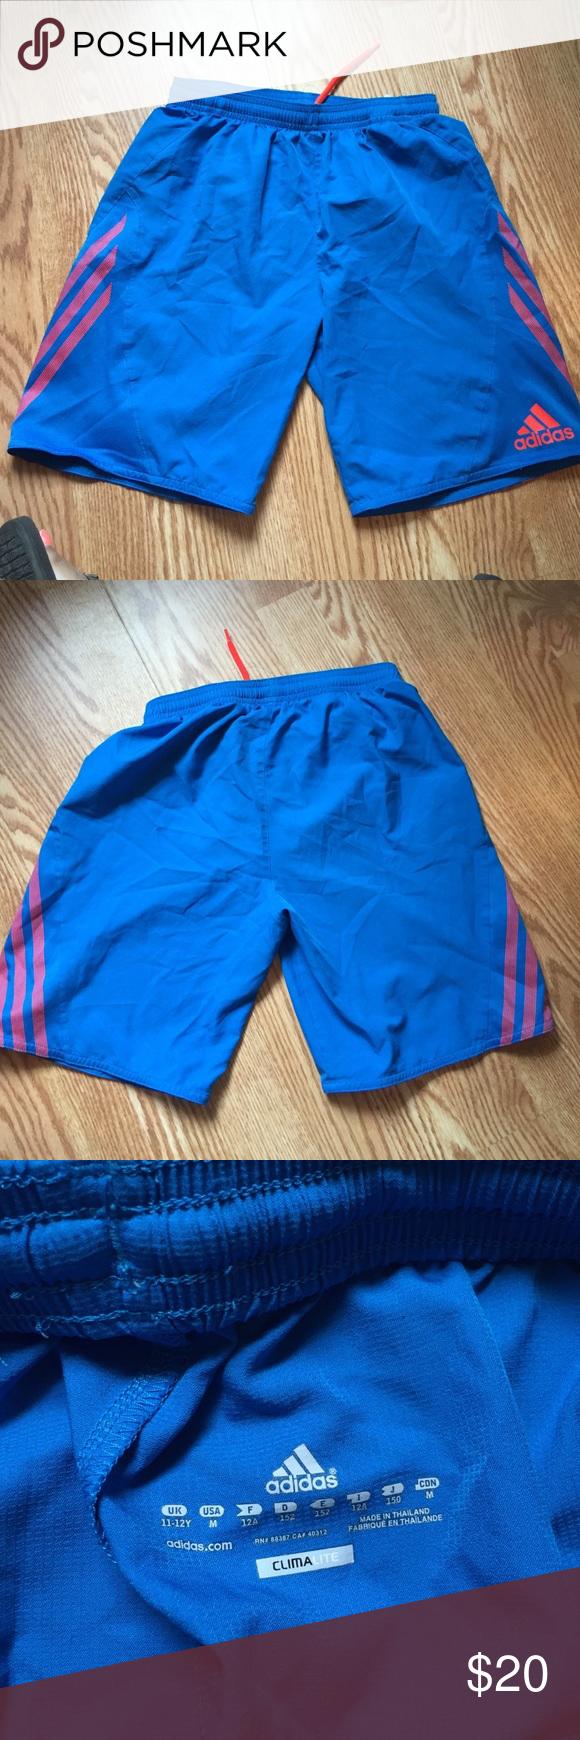 Adidas shorts Great condition Adidas boys shorts size Medium. adidas Bottoms Shorts